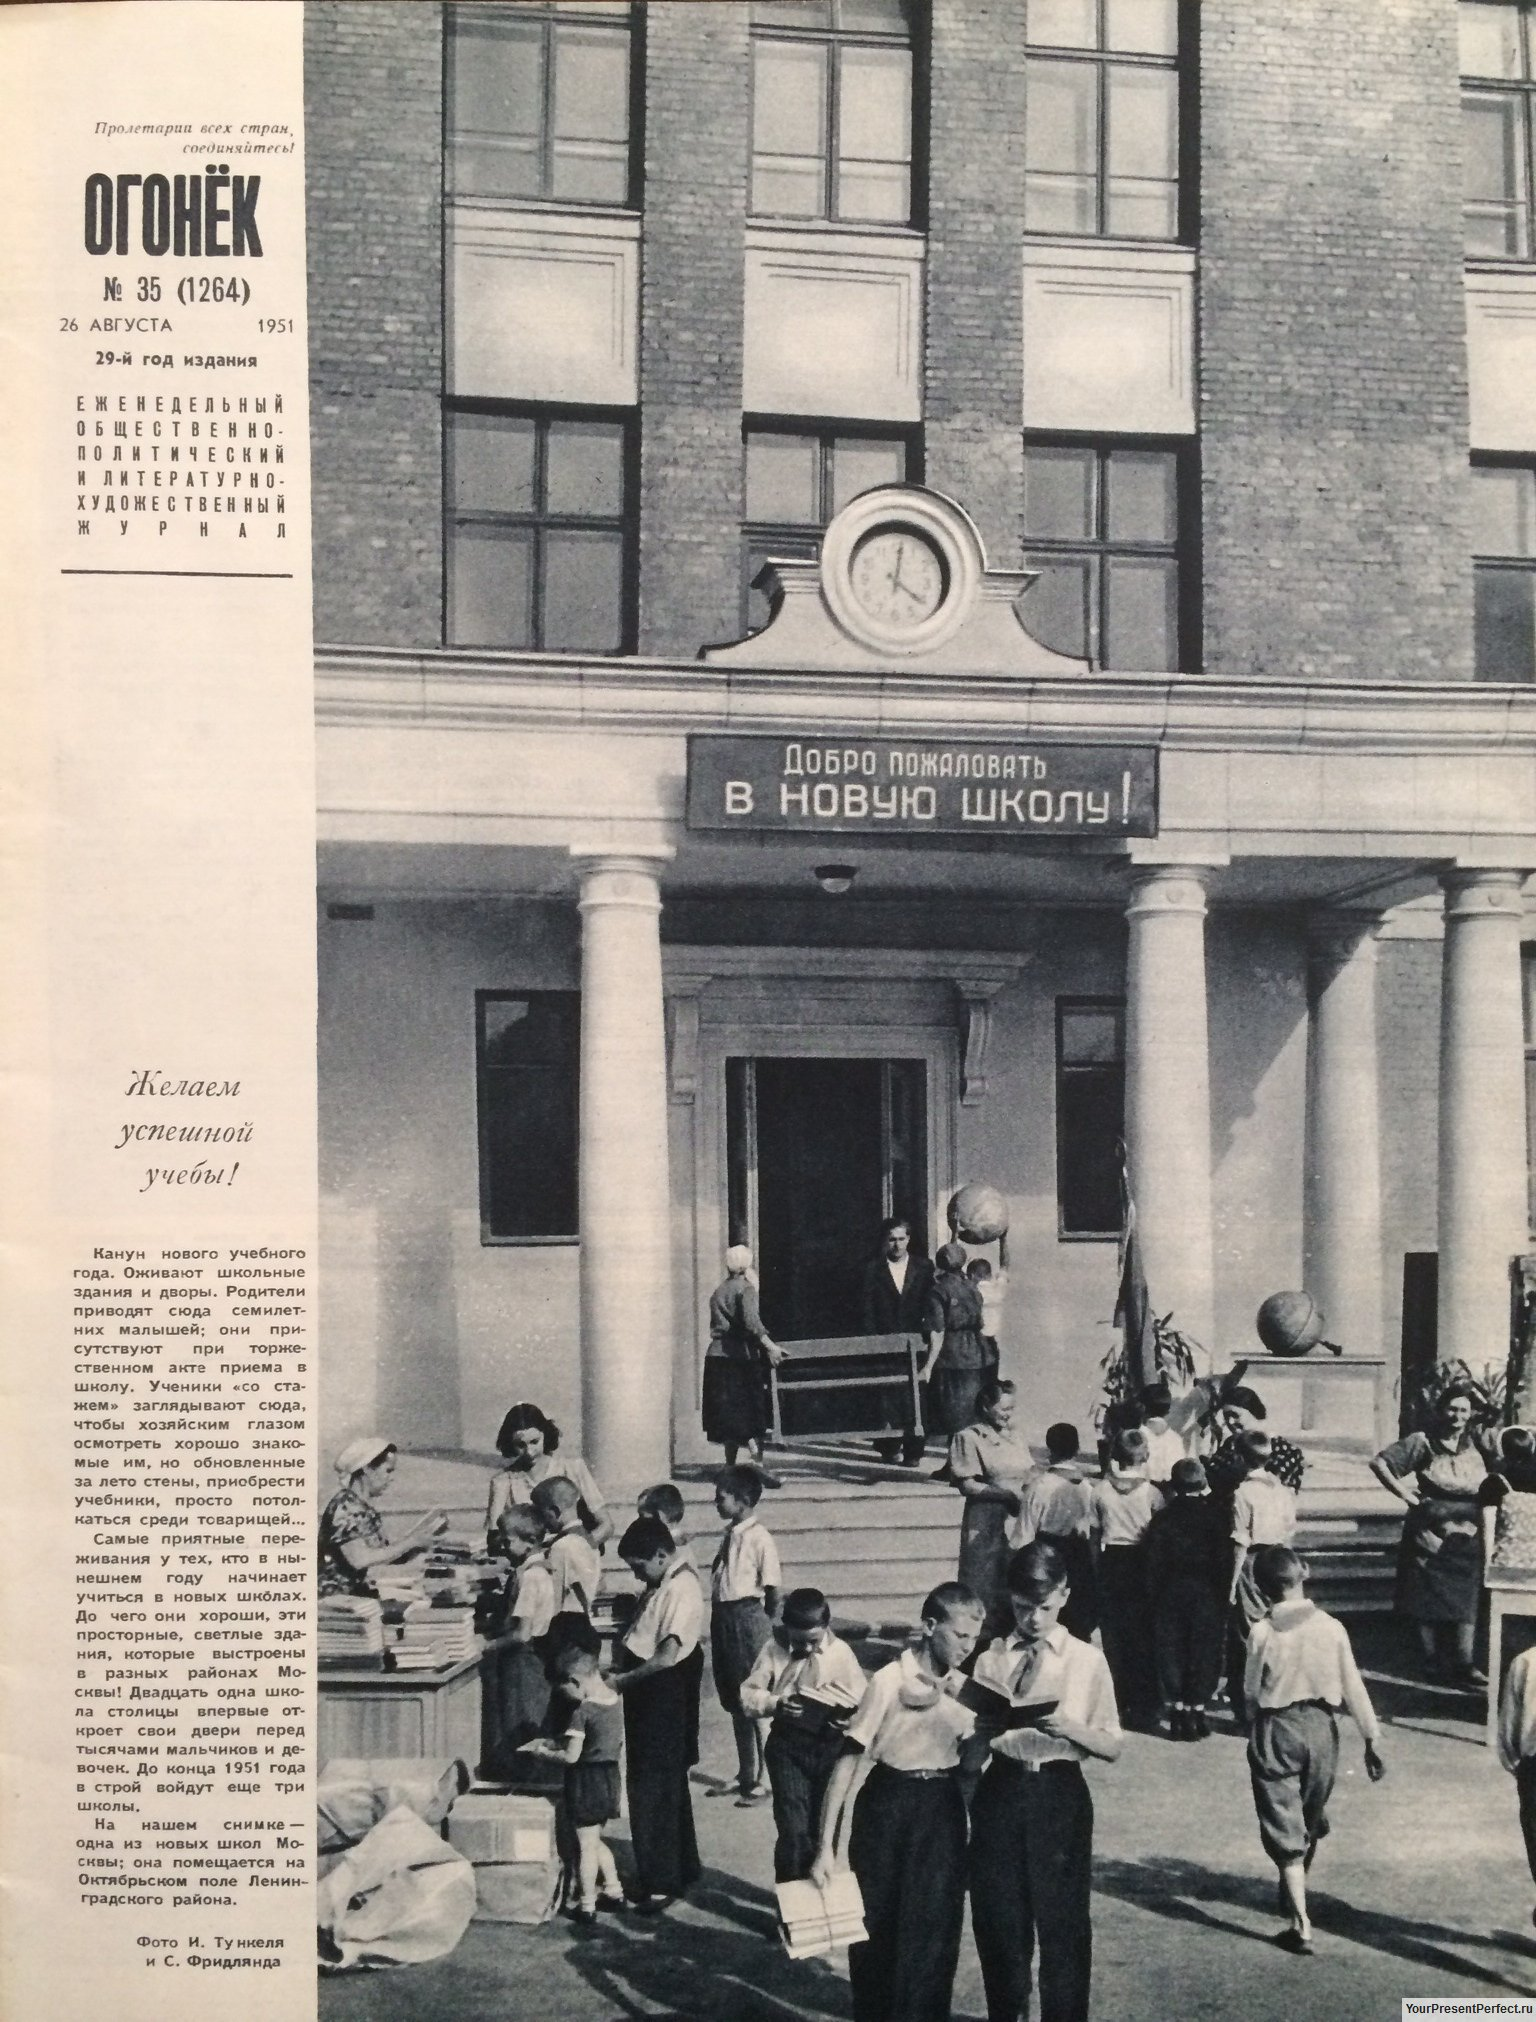 Журнал Огонек №35 26 августа 1951